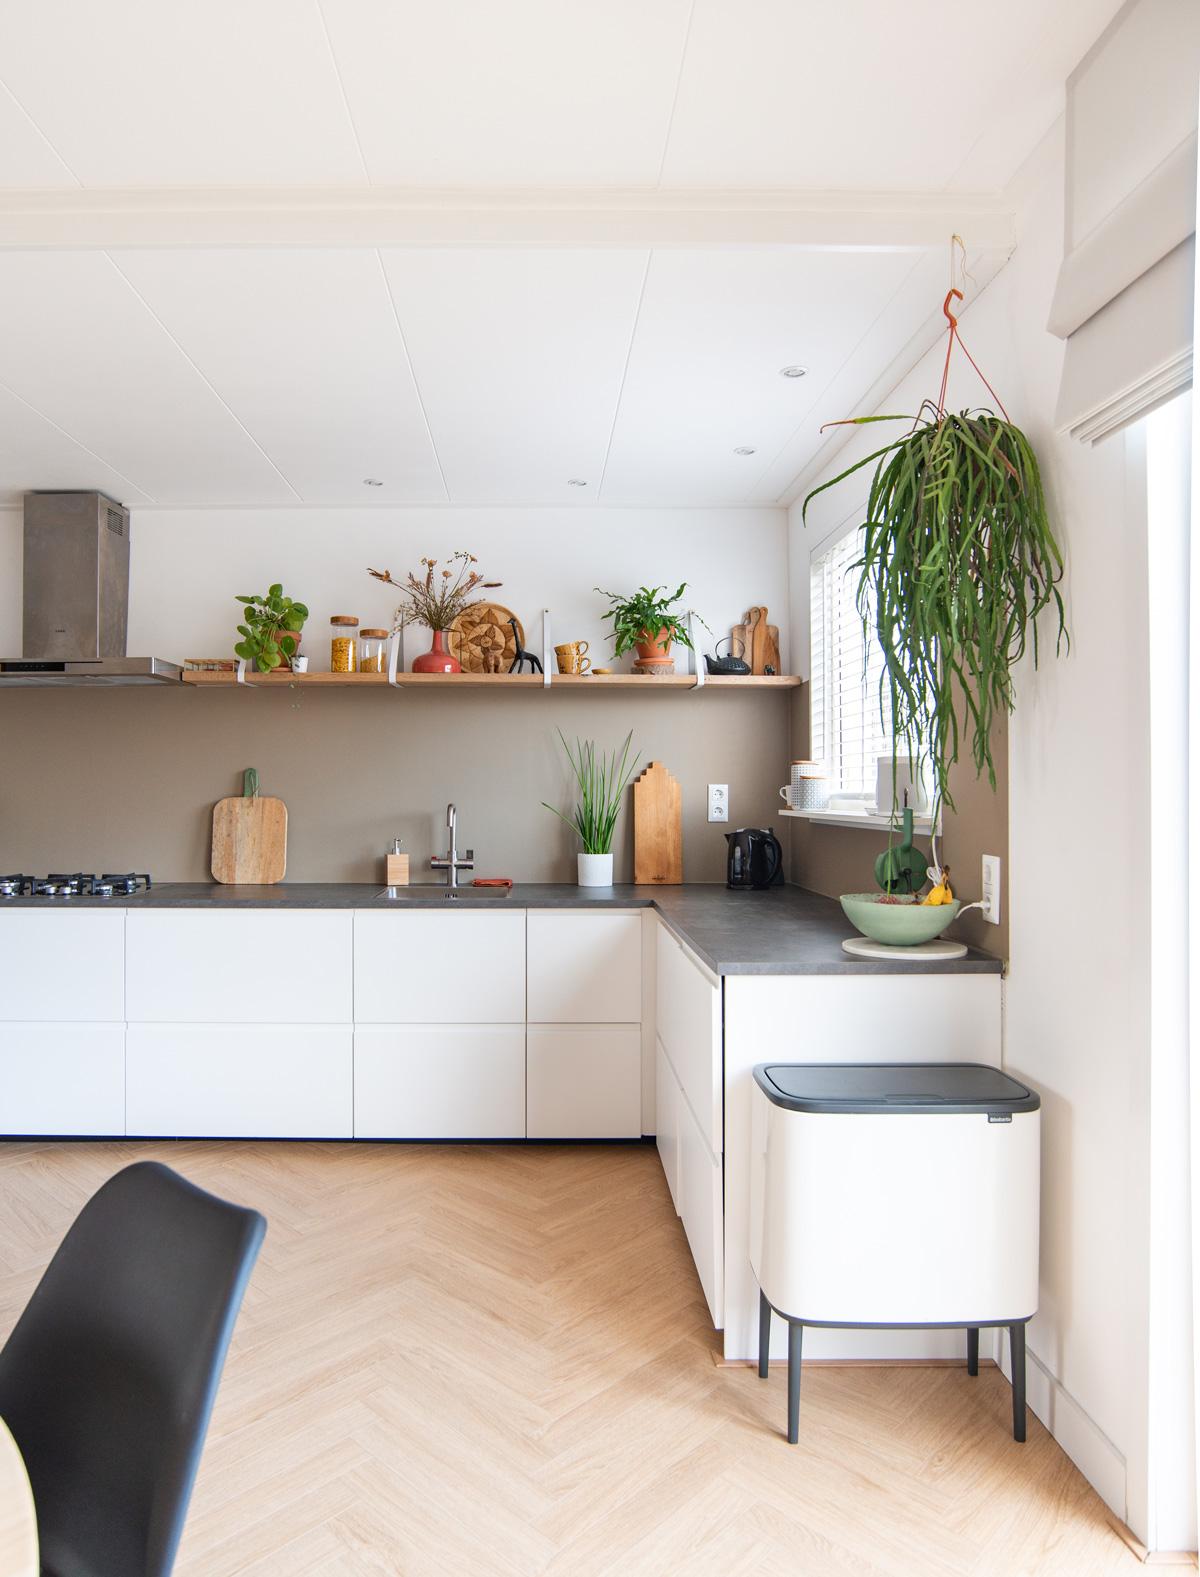 keeelly91blog keuken make-over interieur interieurstylist interieurfotograaf wonen wooninspiratie mud soldier